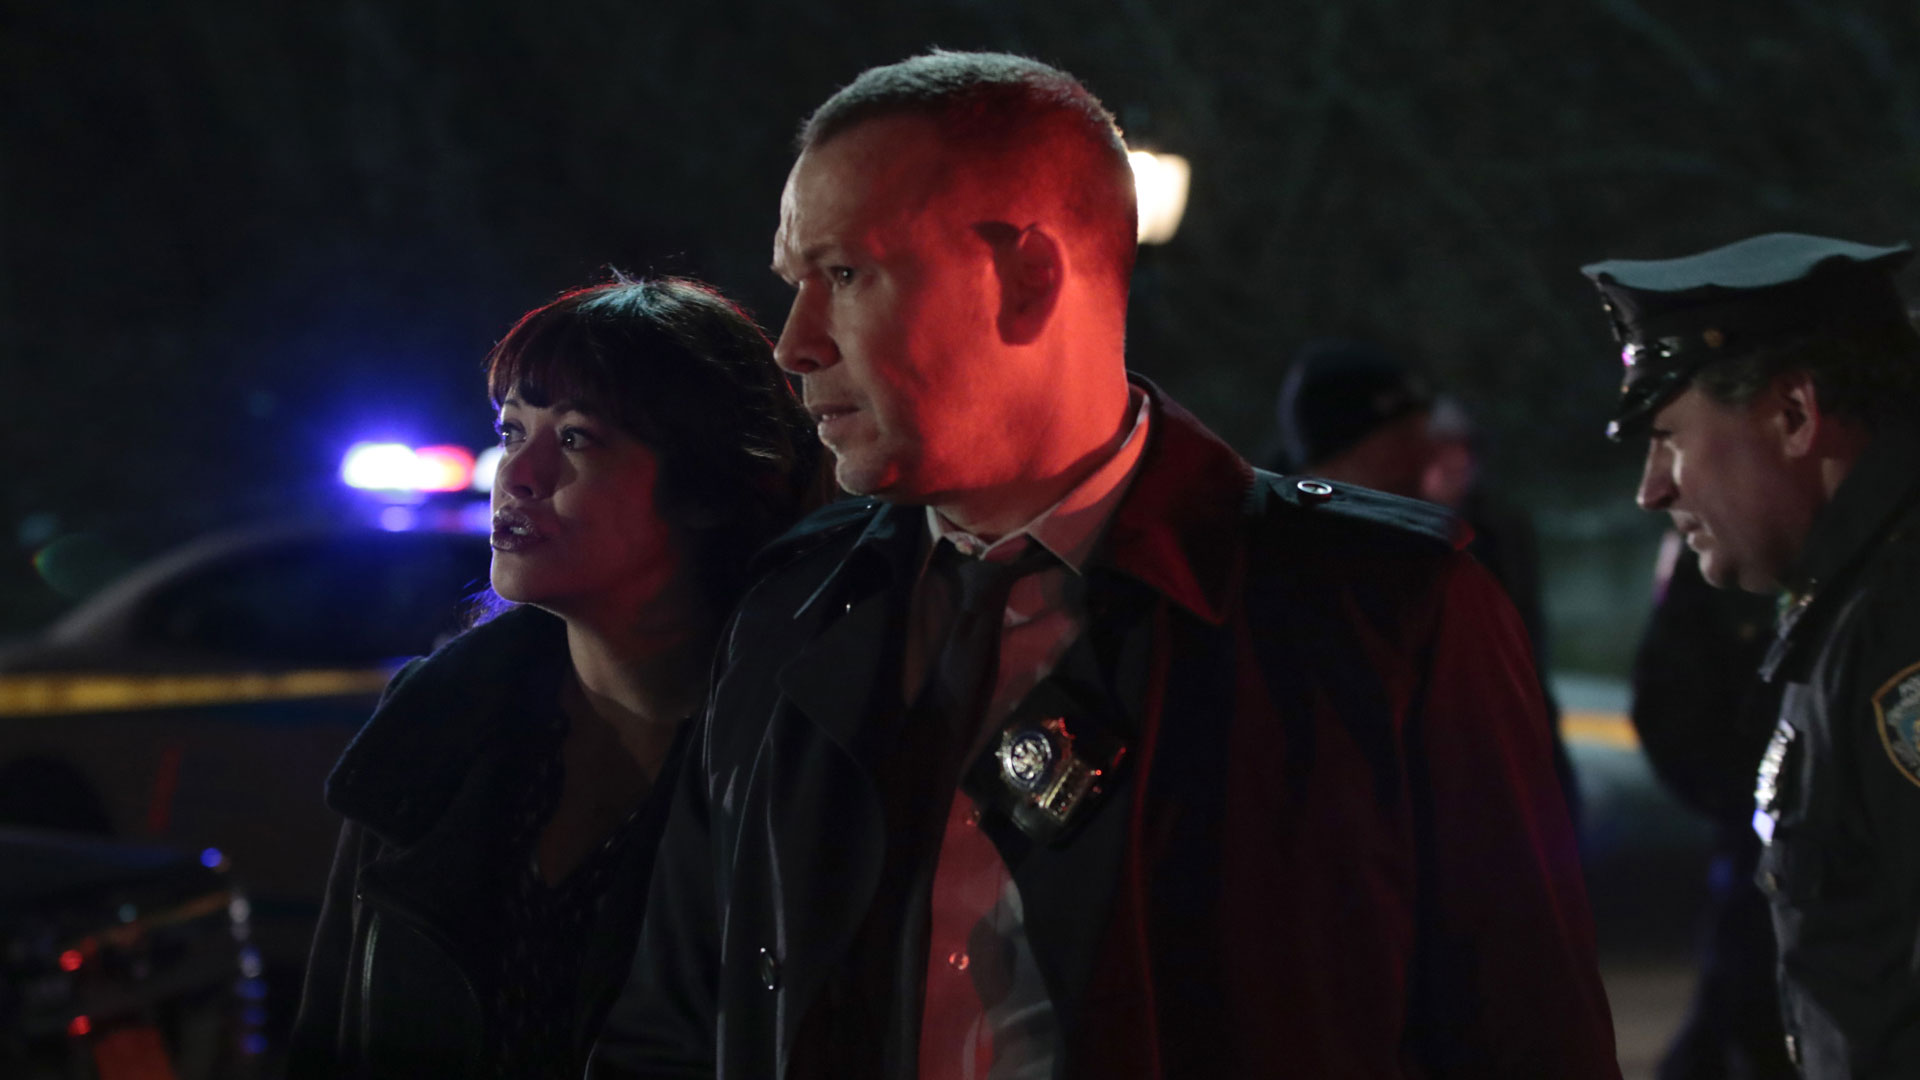 Marisa Ramirez as Detective Maria Baez and Donnie Wahlberg as Detective Danny Reagan